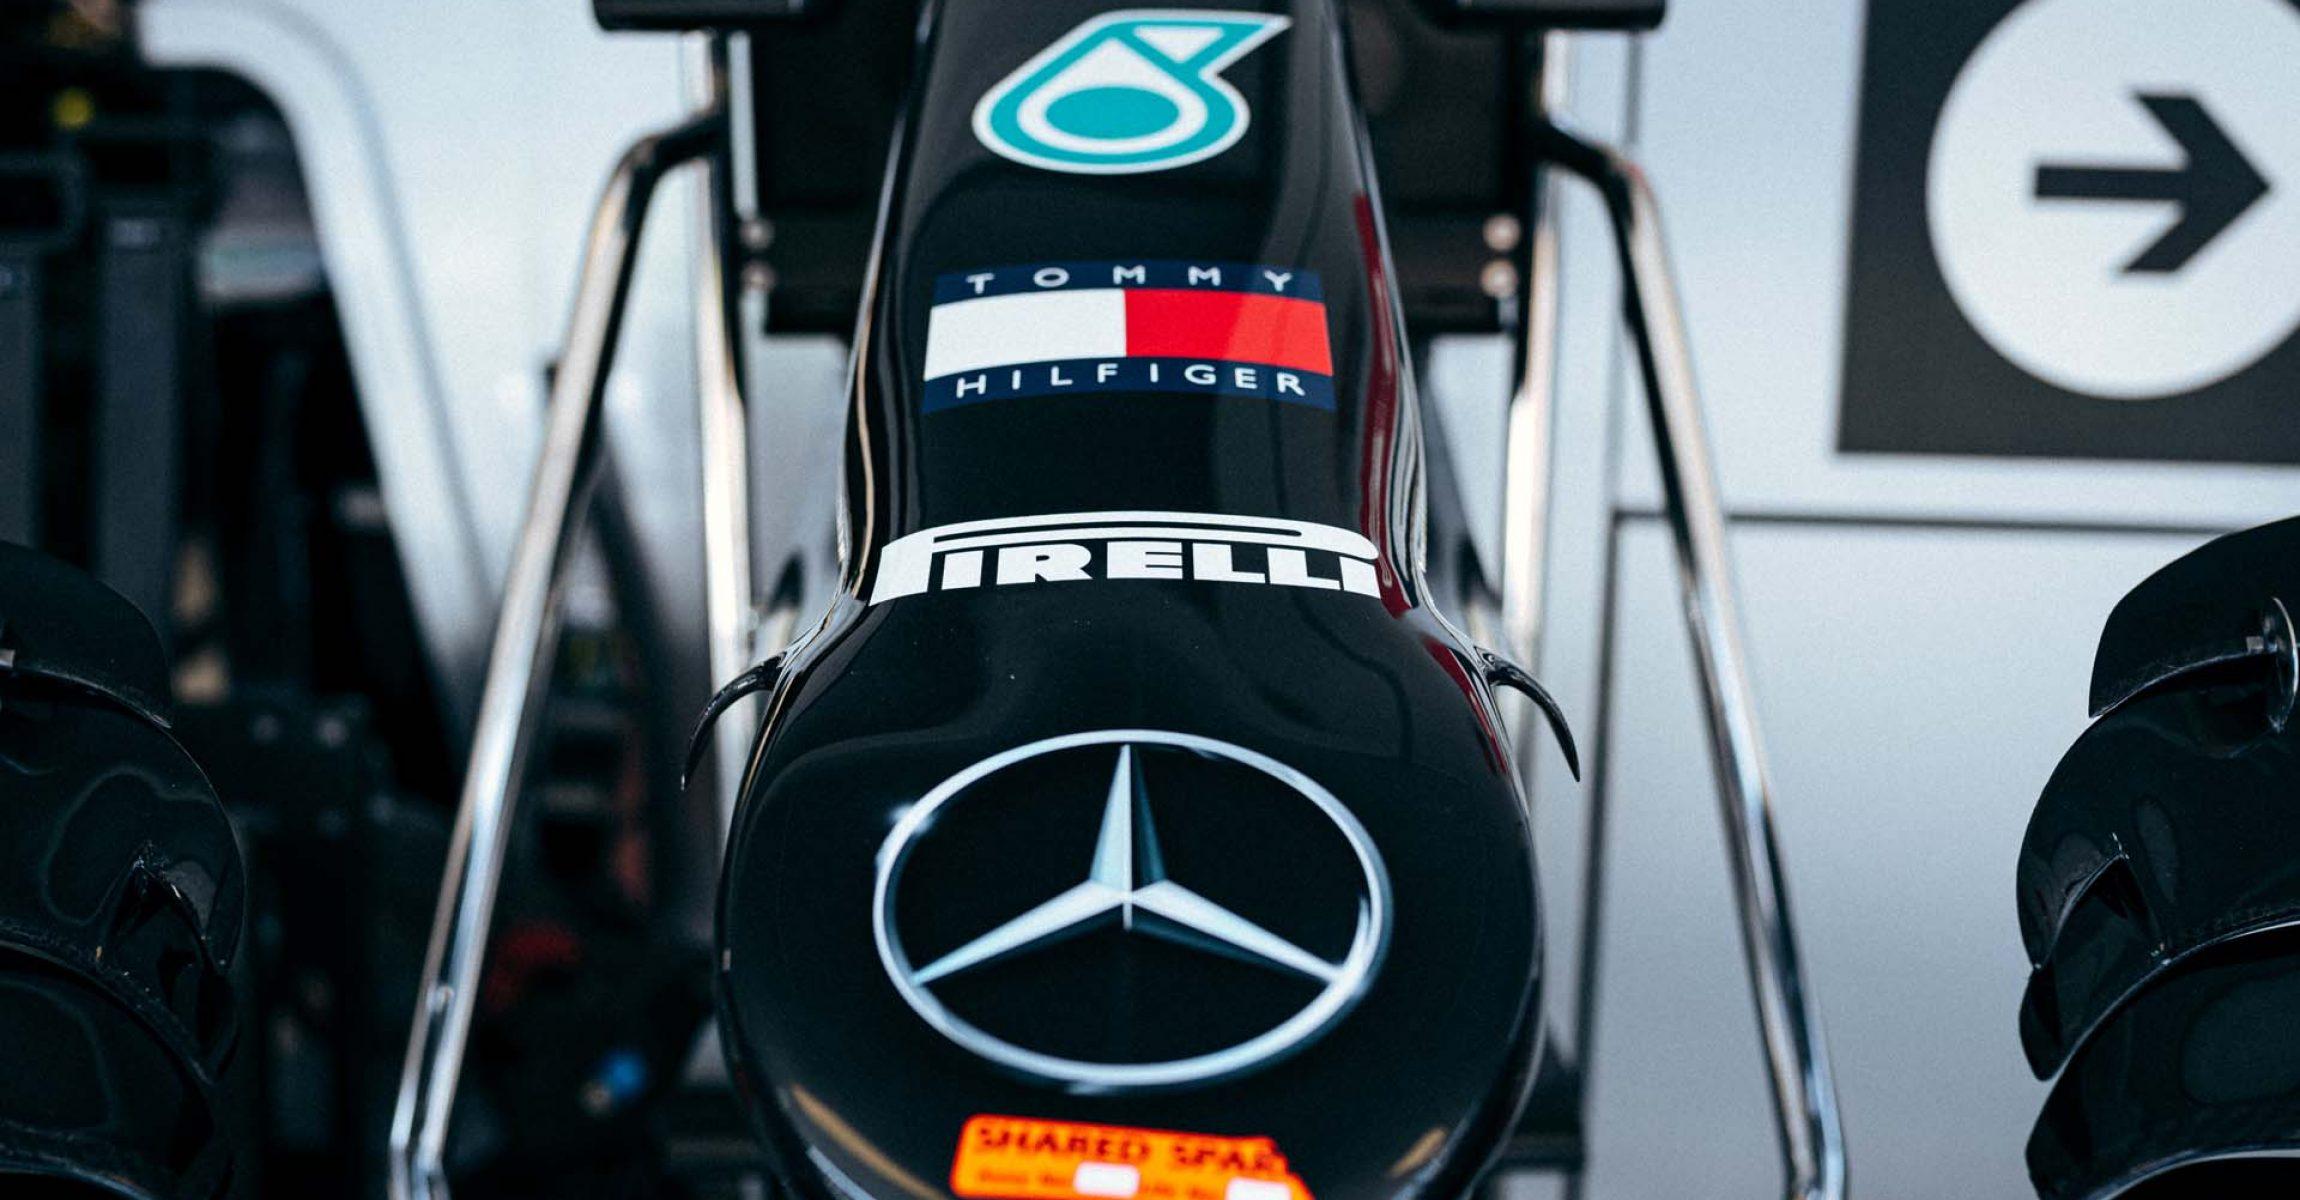 2020 Russian Grand Prix, Thursday - Sebastian Kawka Mercedes nose logo